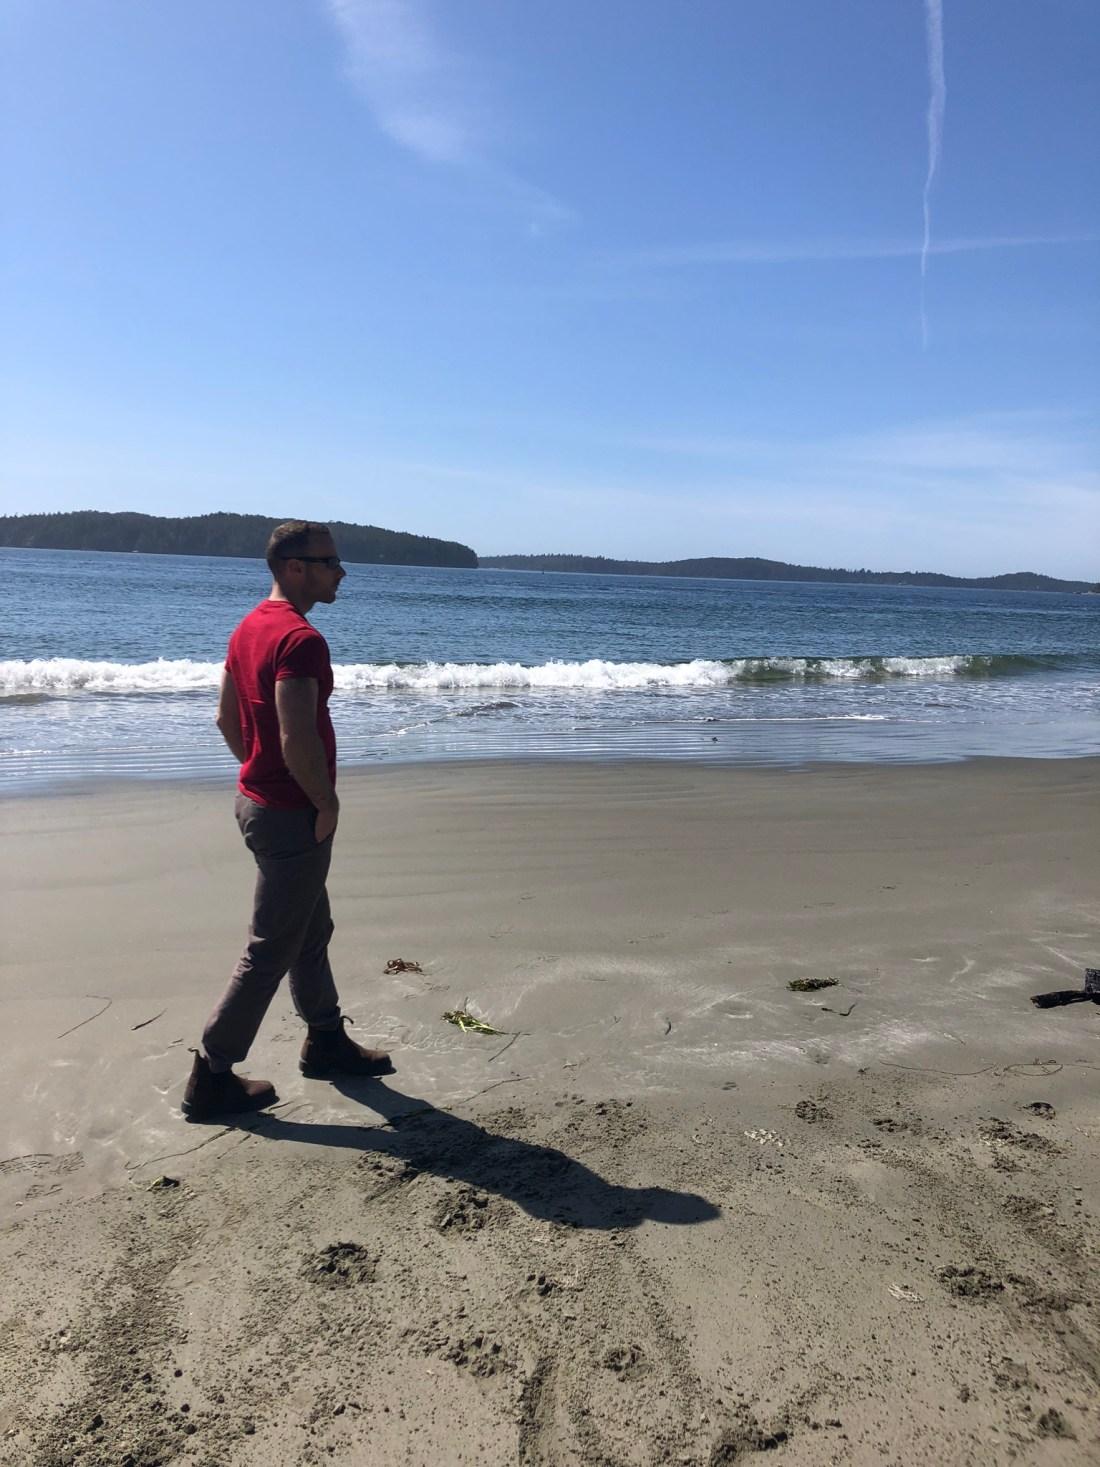 Walking on Tonquin Beach, Tofino